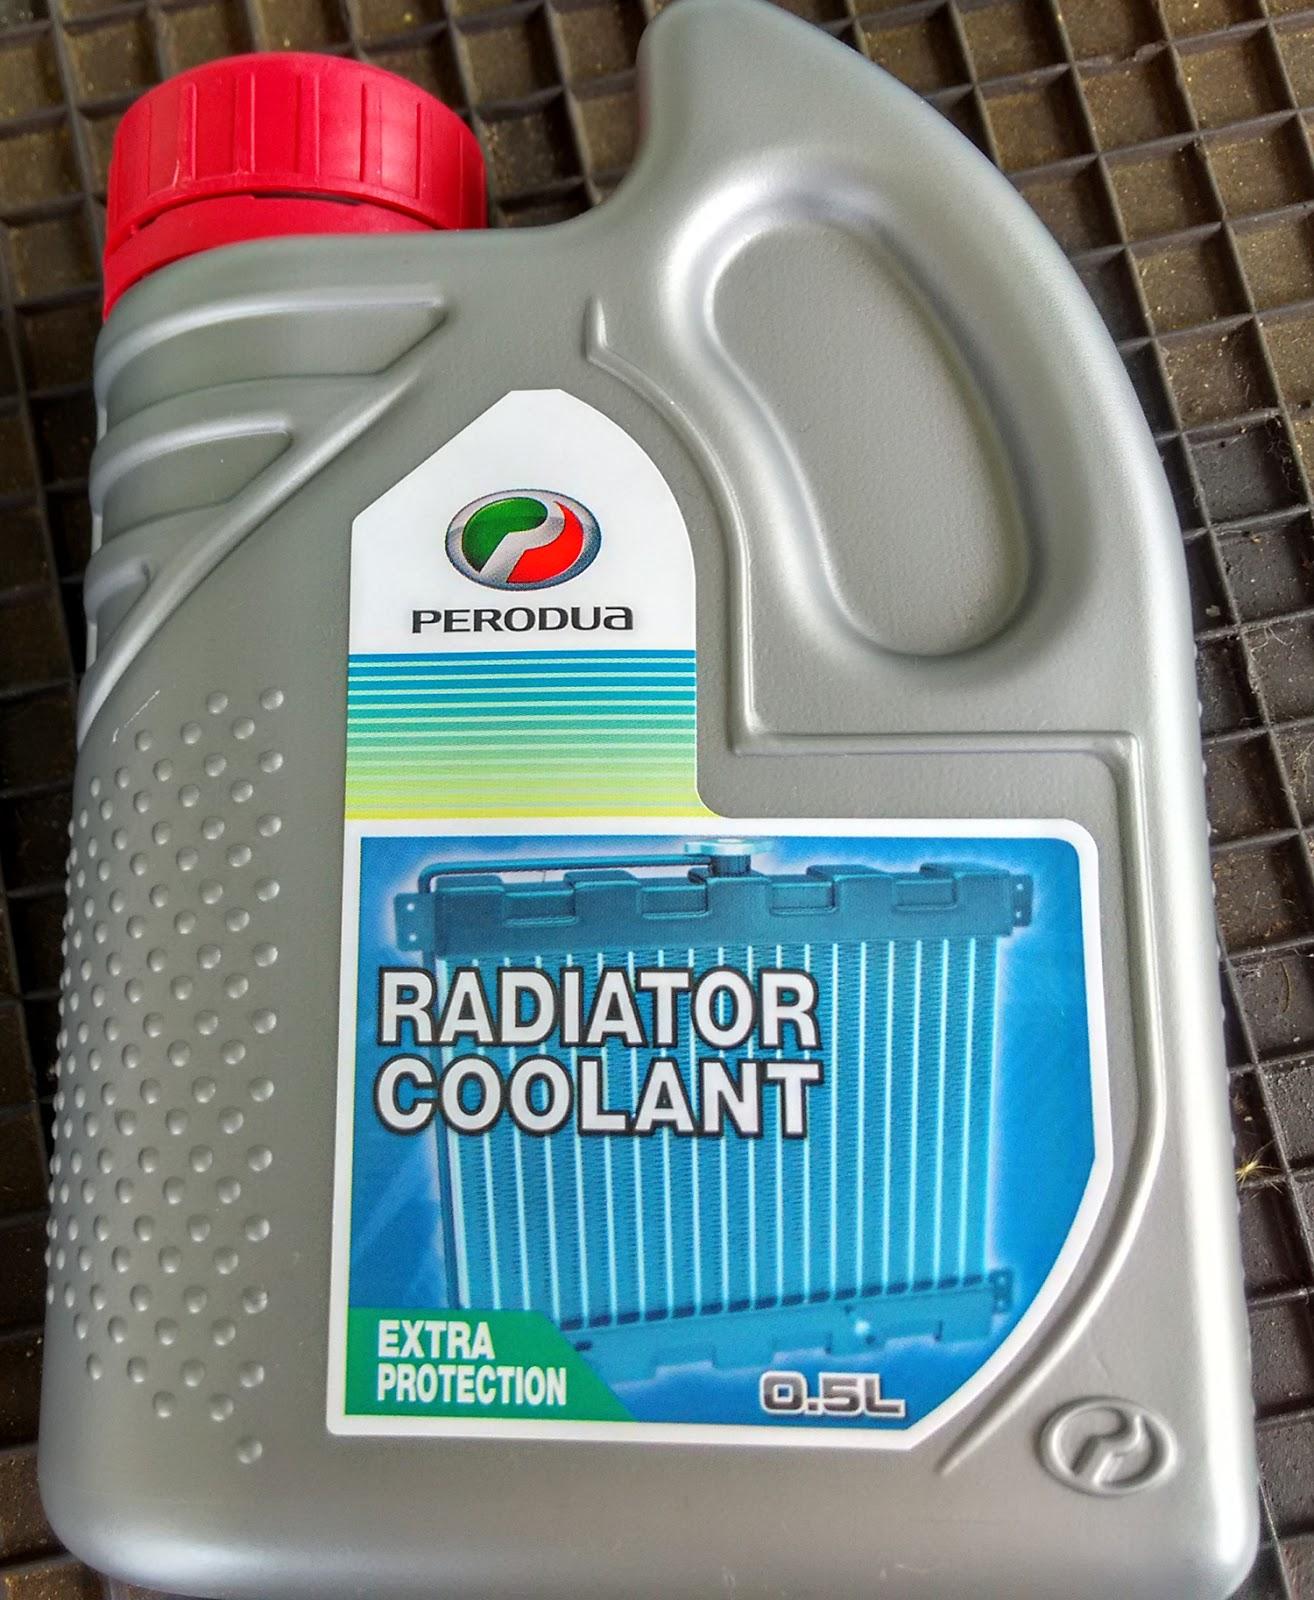 Perodua Bezza 2016 Engine Coolant Color Radiator Premix05 Litre Liquid Is Red In